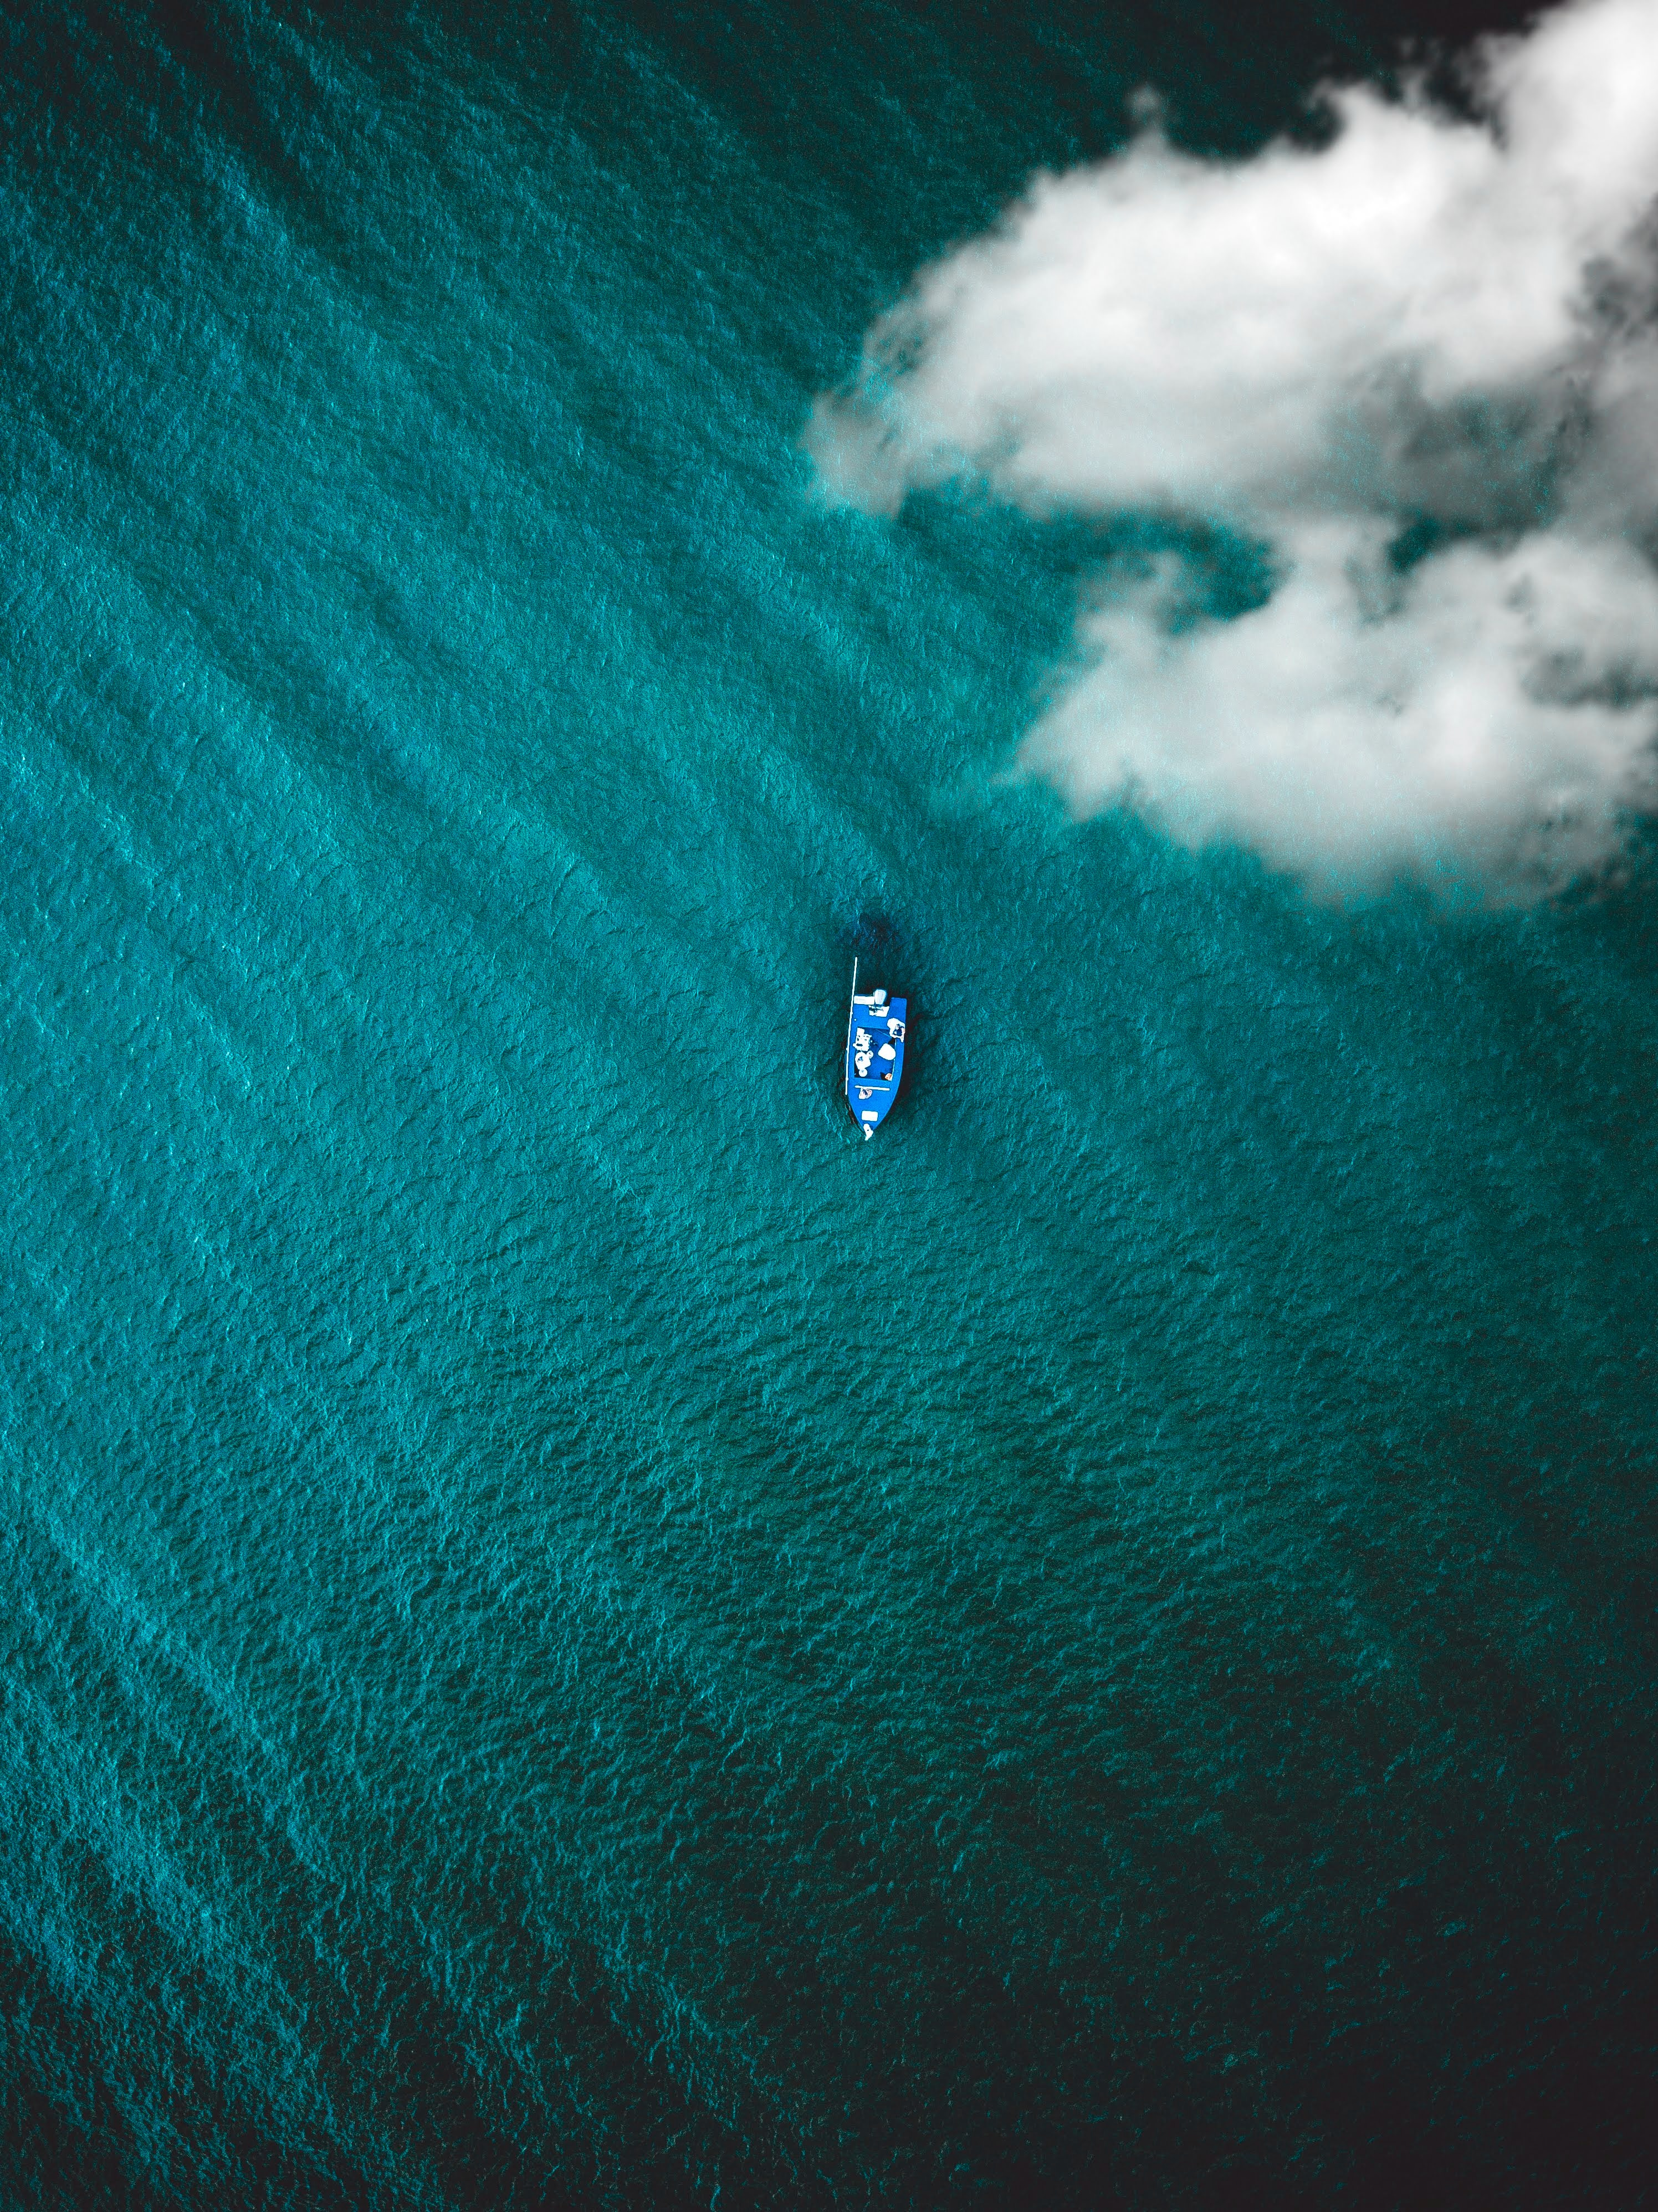 Boat sailing through water